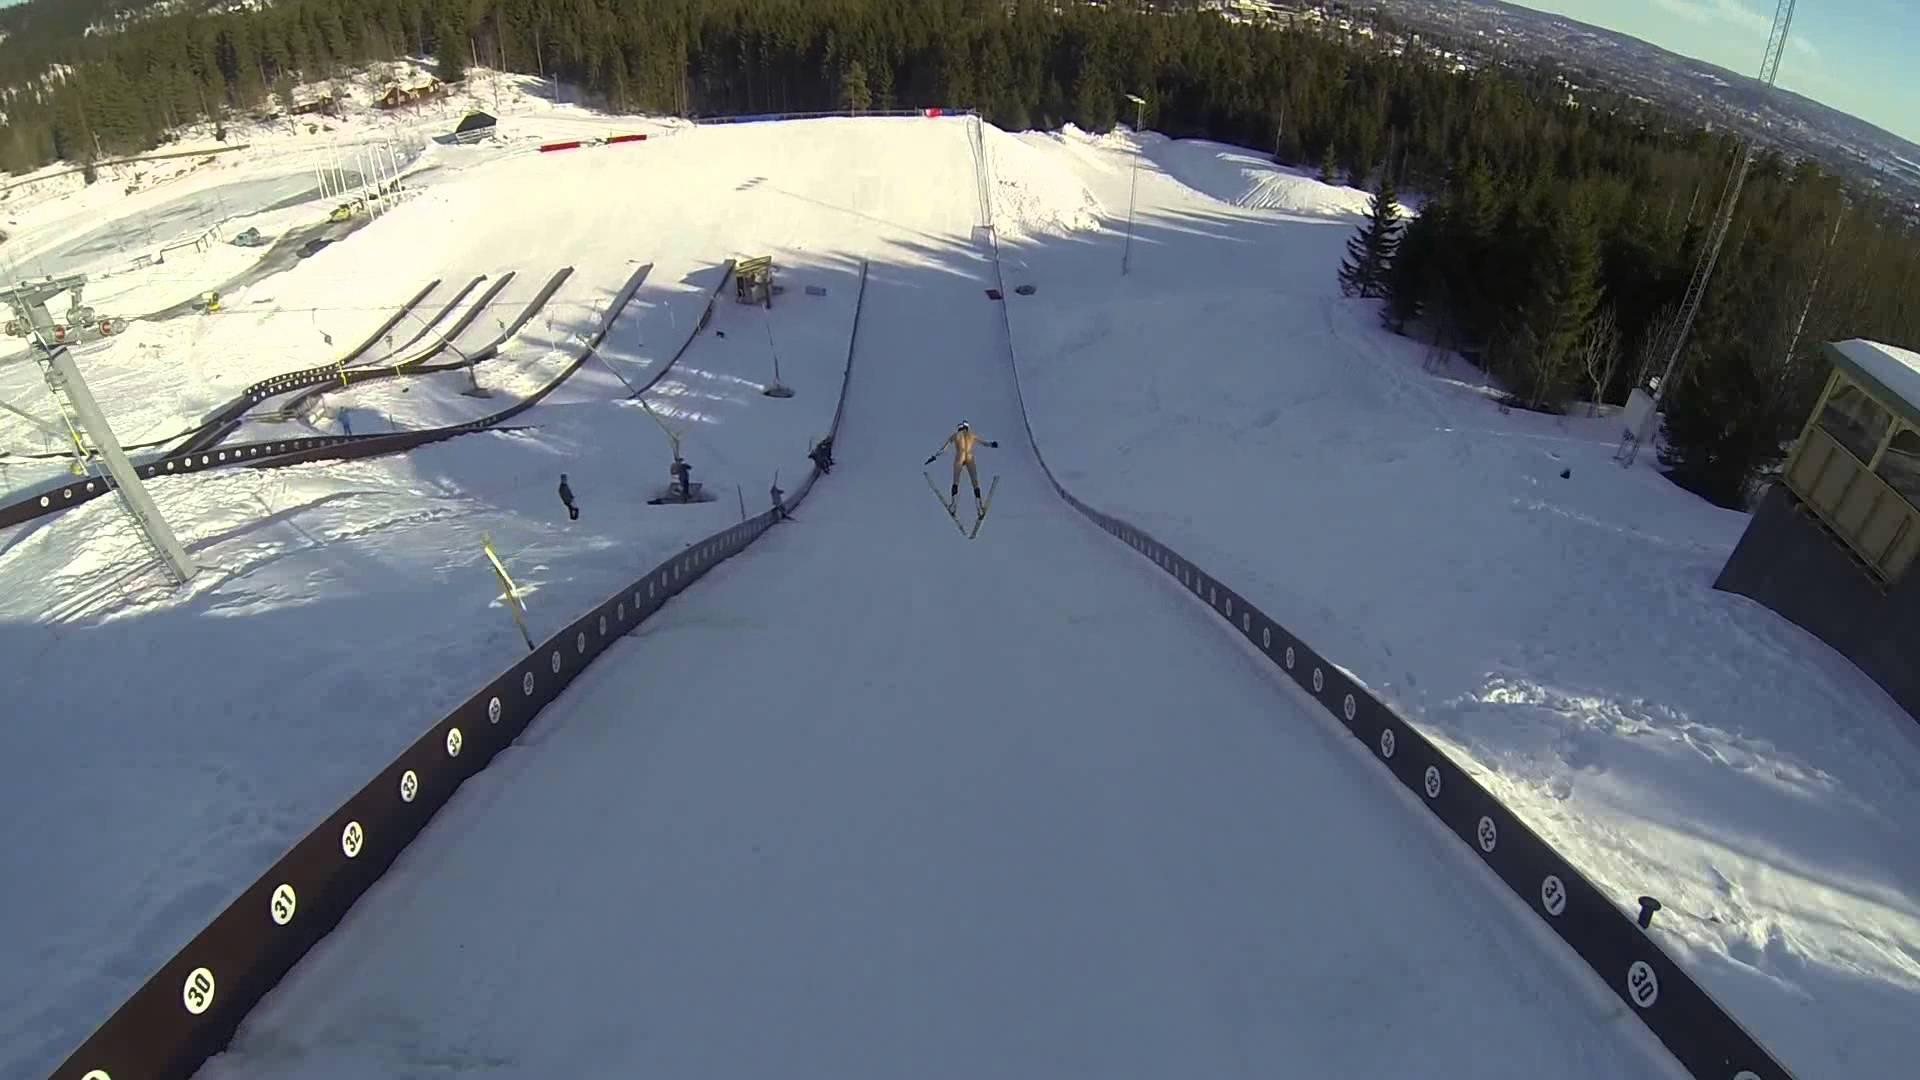 Granerud skispringen nackt. 💄 Der Postillon. 2020-01-23